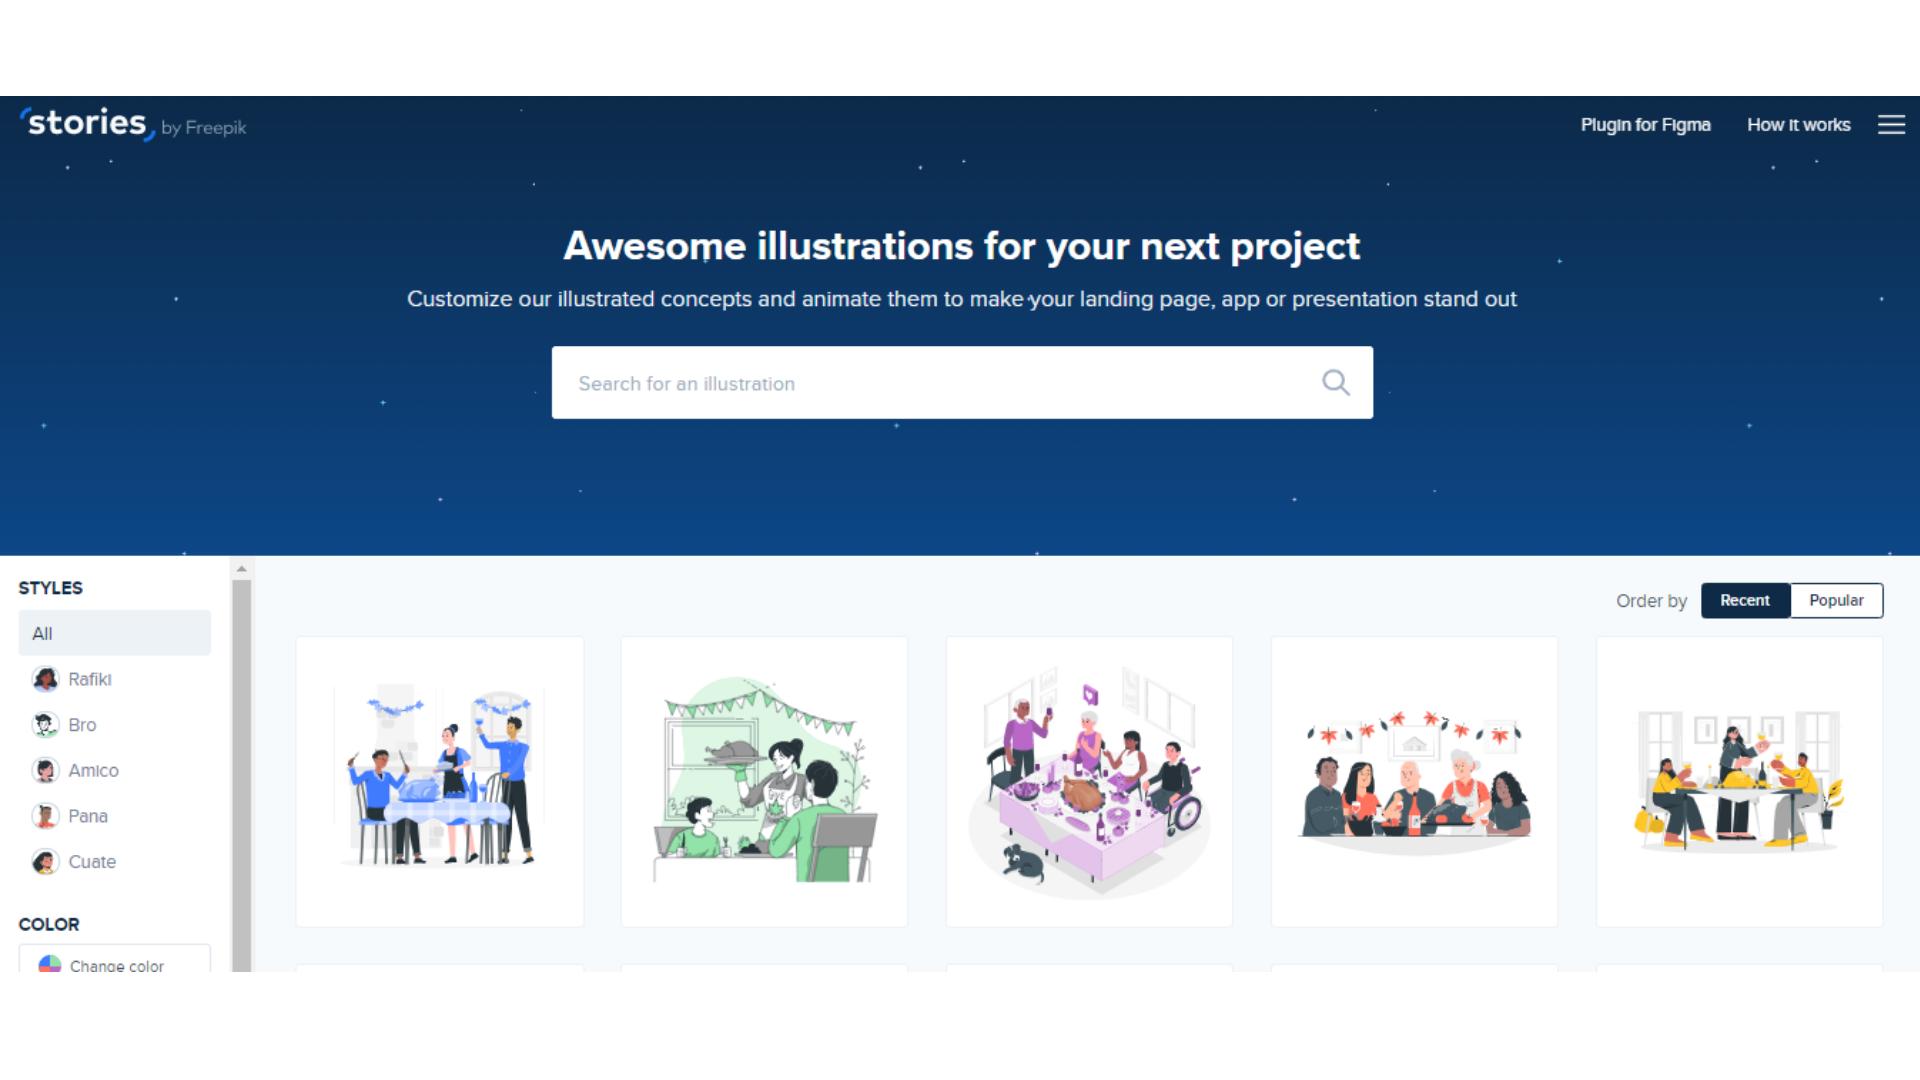 Stories by Freepik free illustration resource